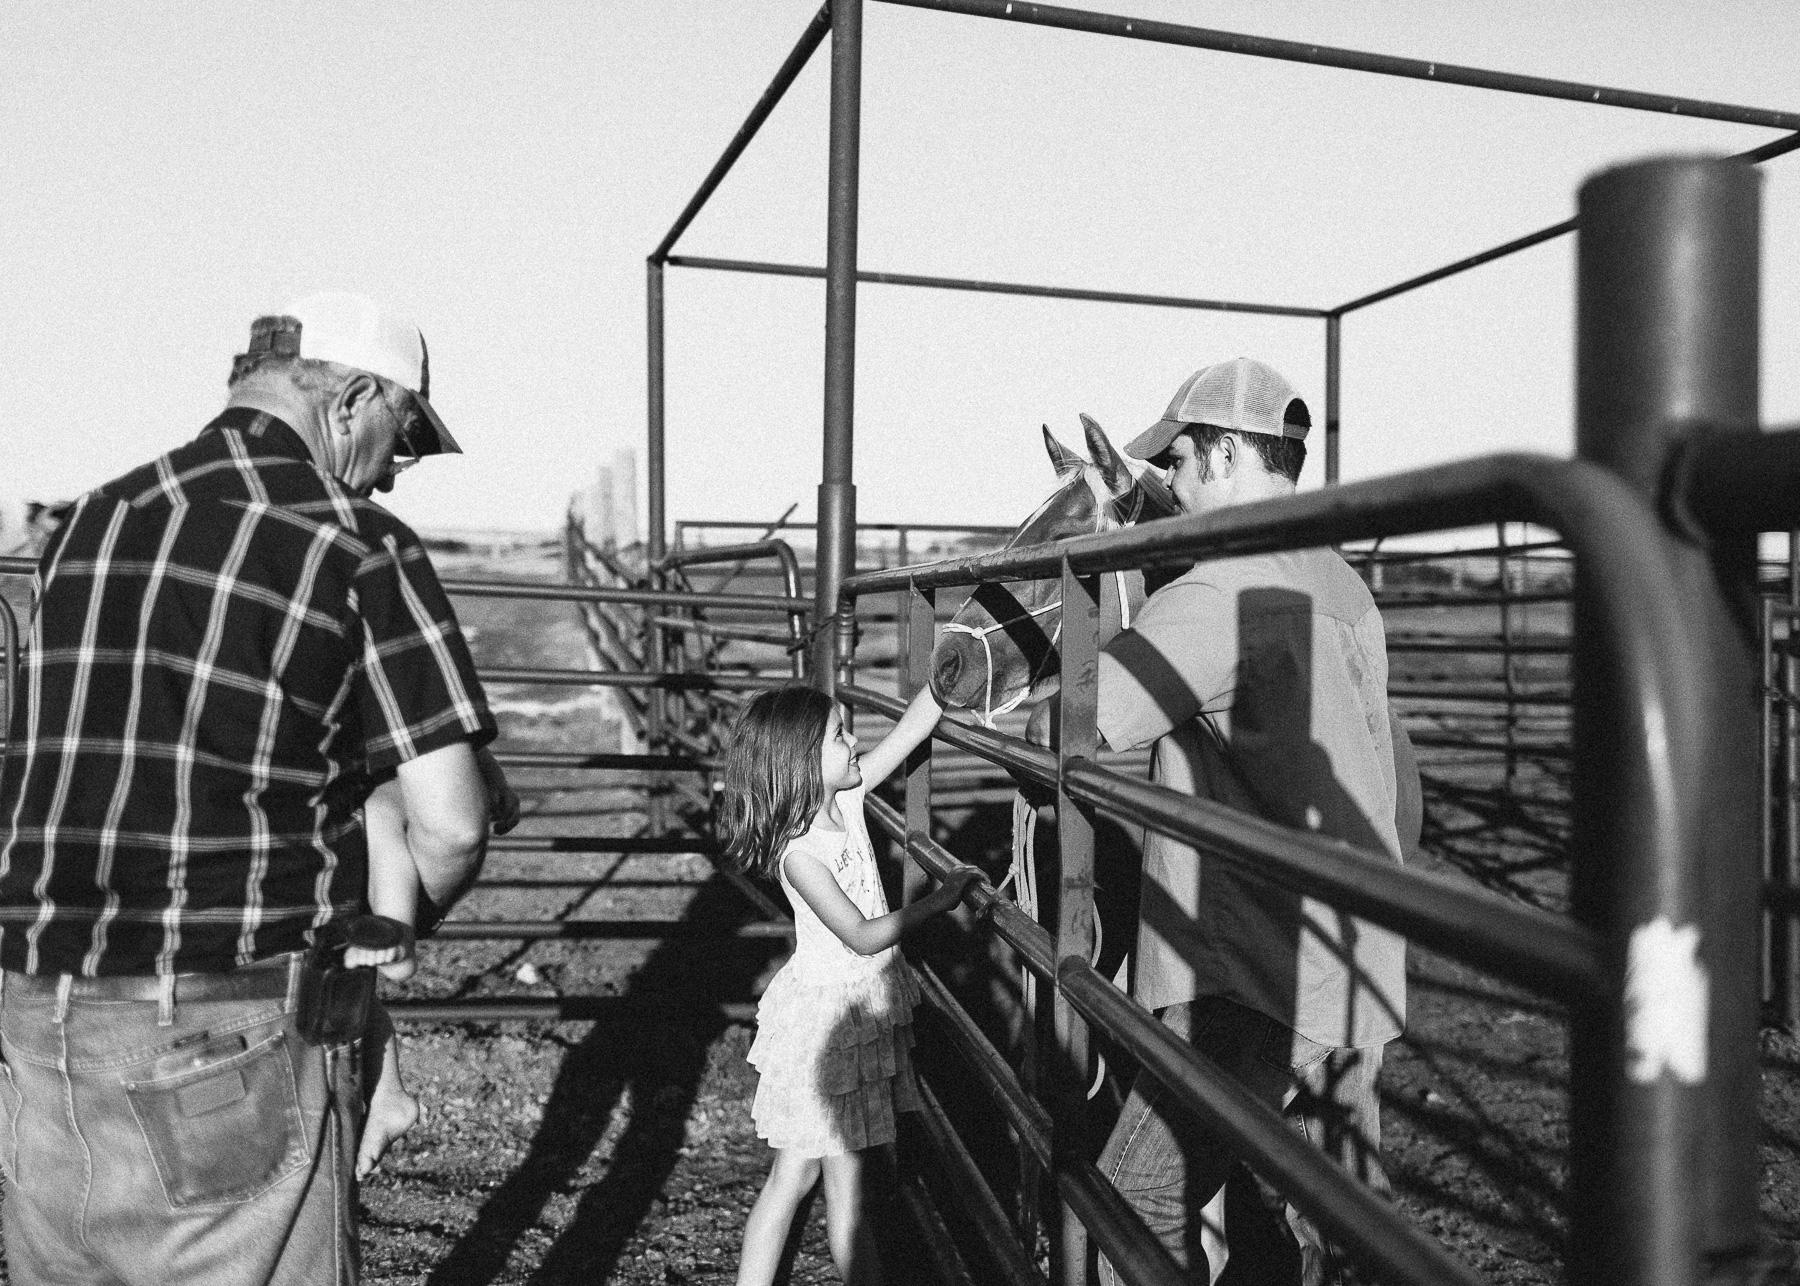 horse smelling girl